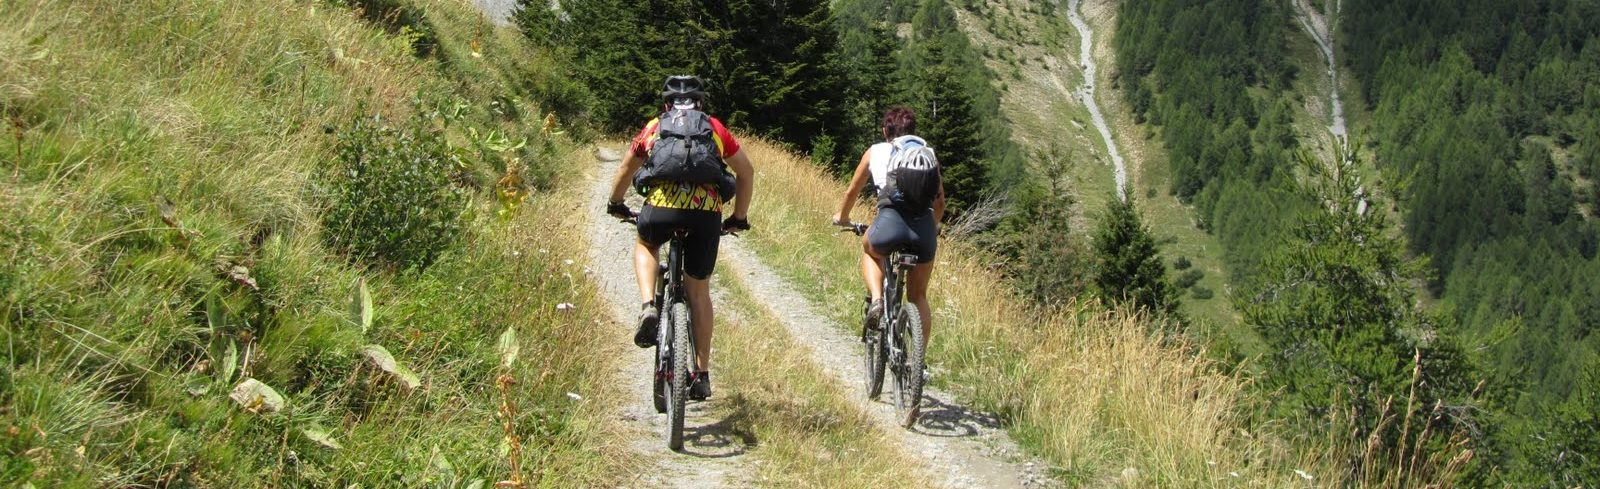 Cai Uget - Gruppo Mountain Bike